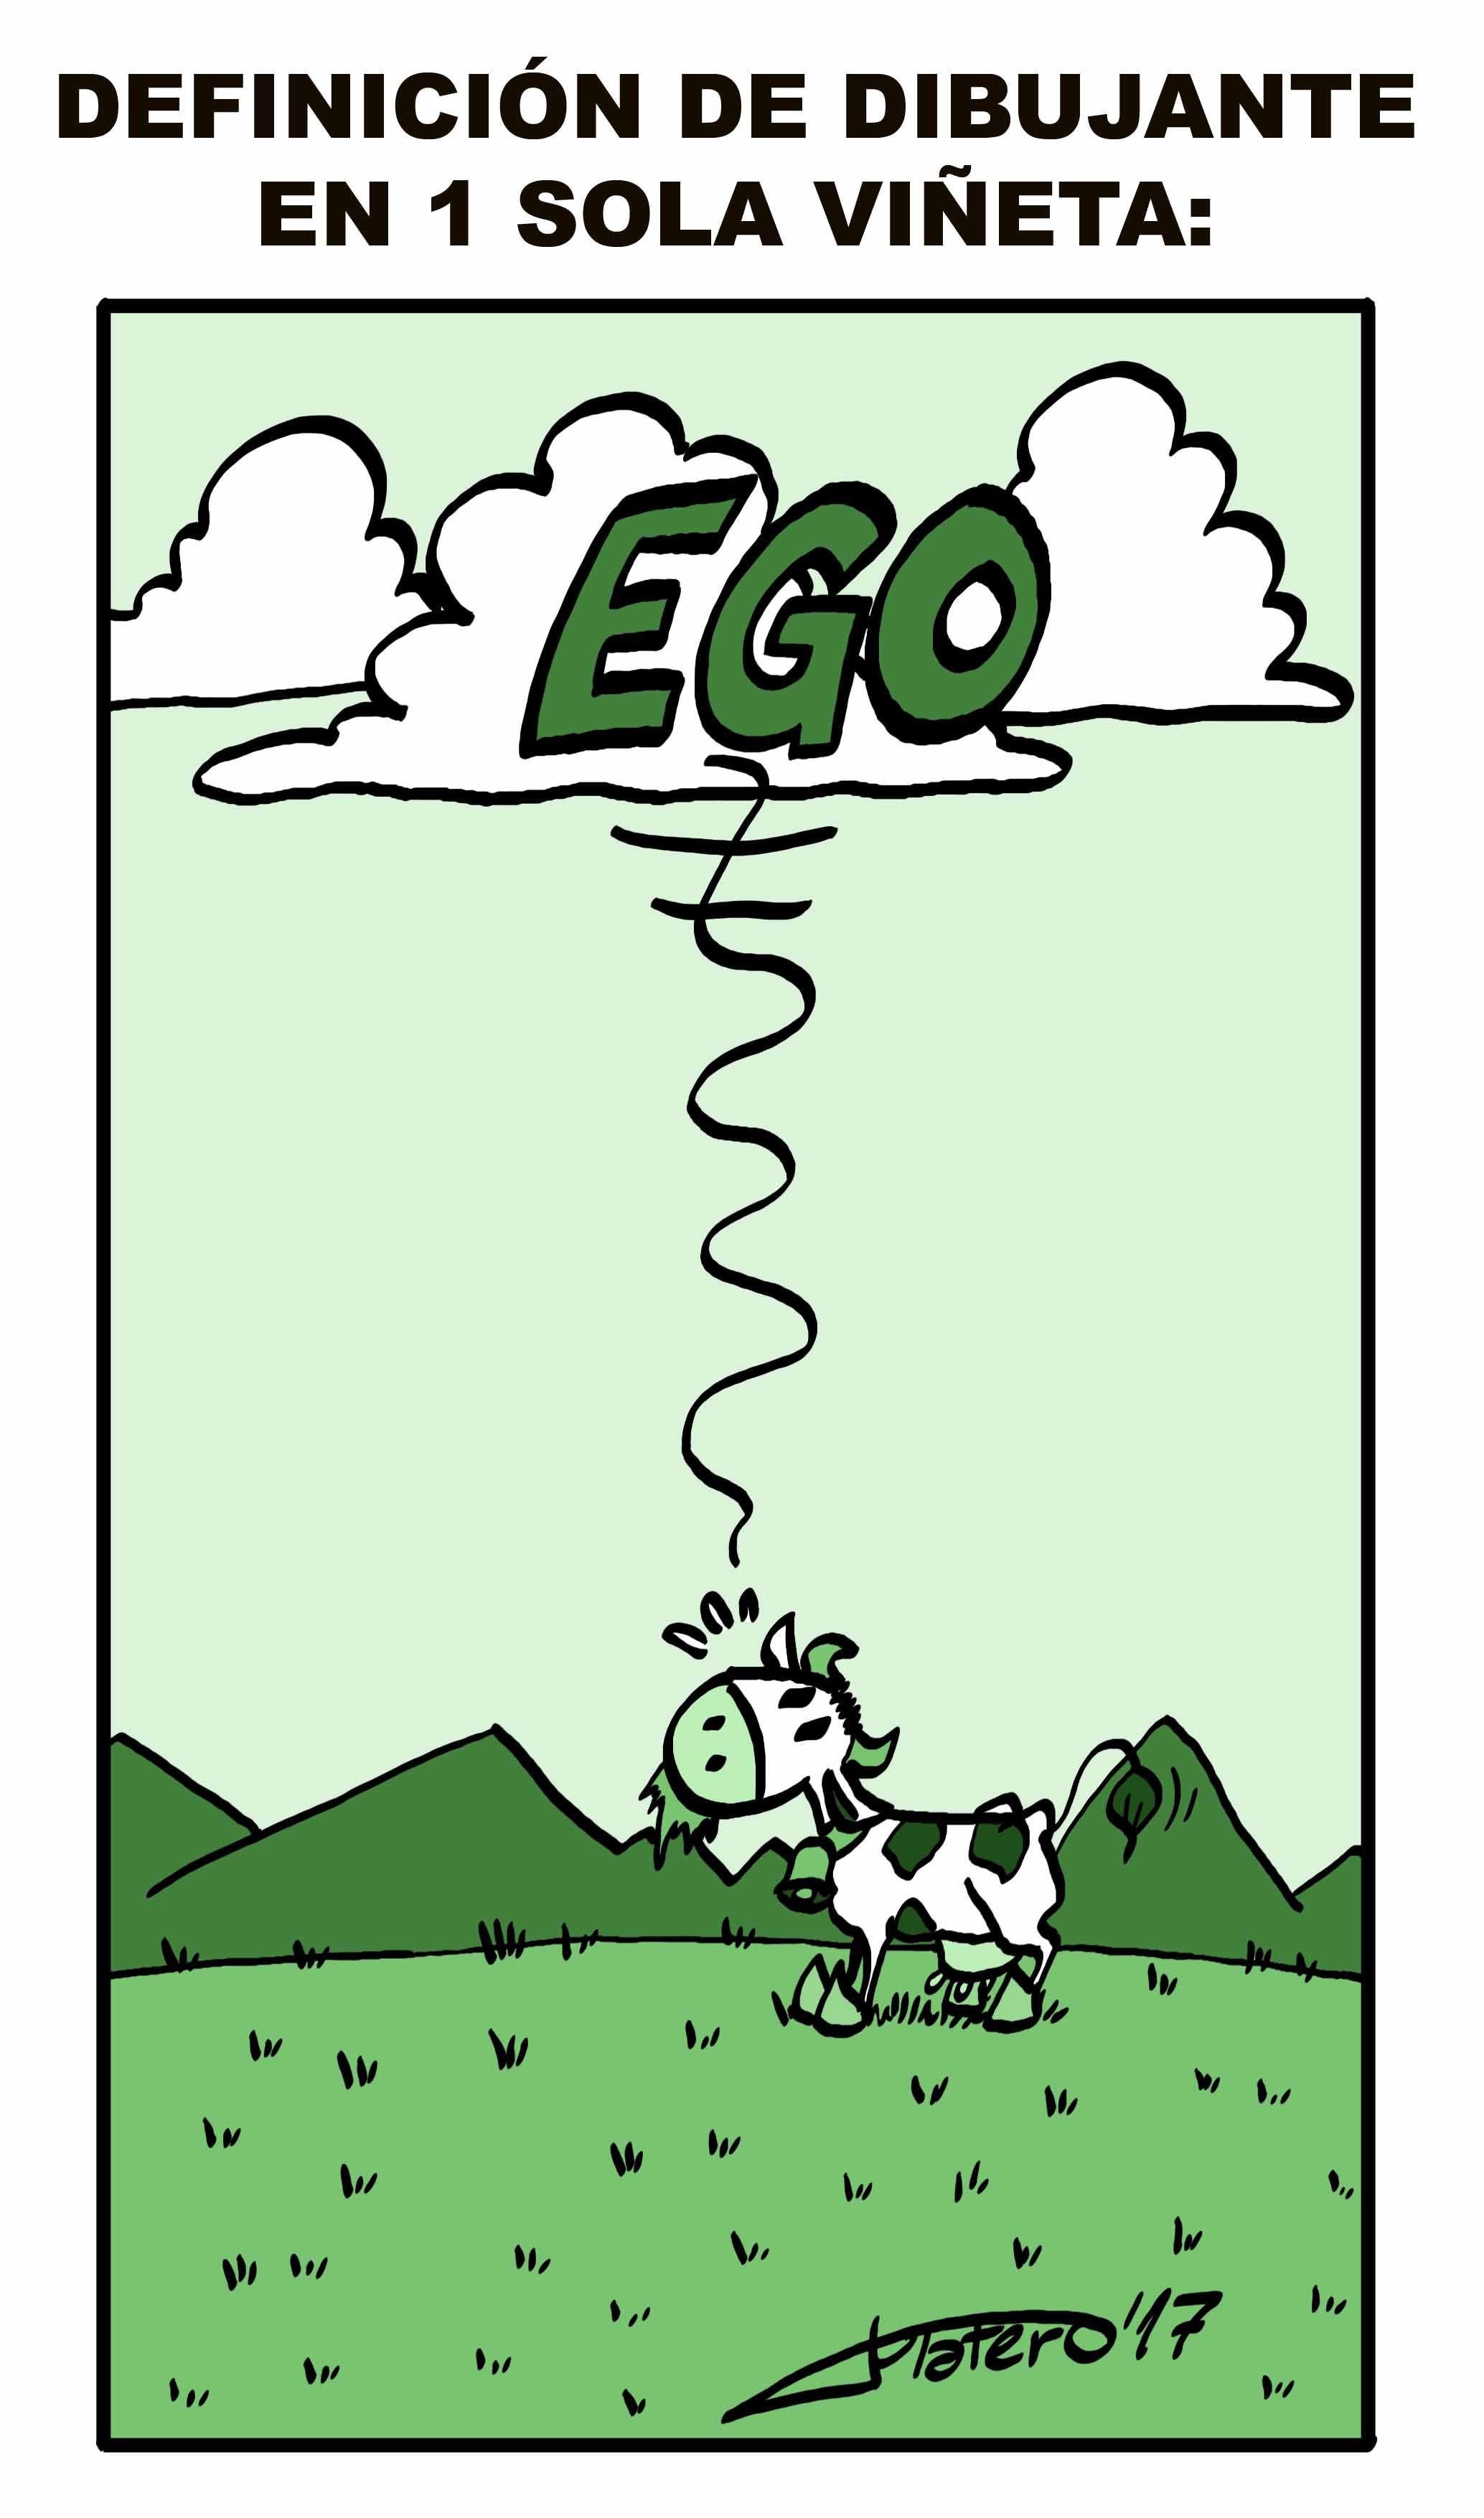 ego_dibujantes_elmundodeplatero_josé_luis_platero